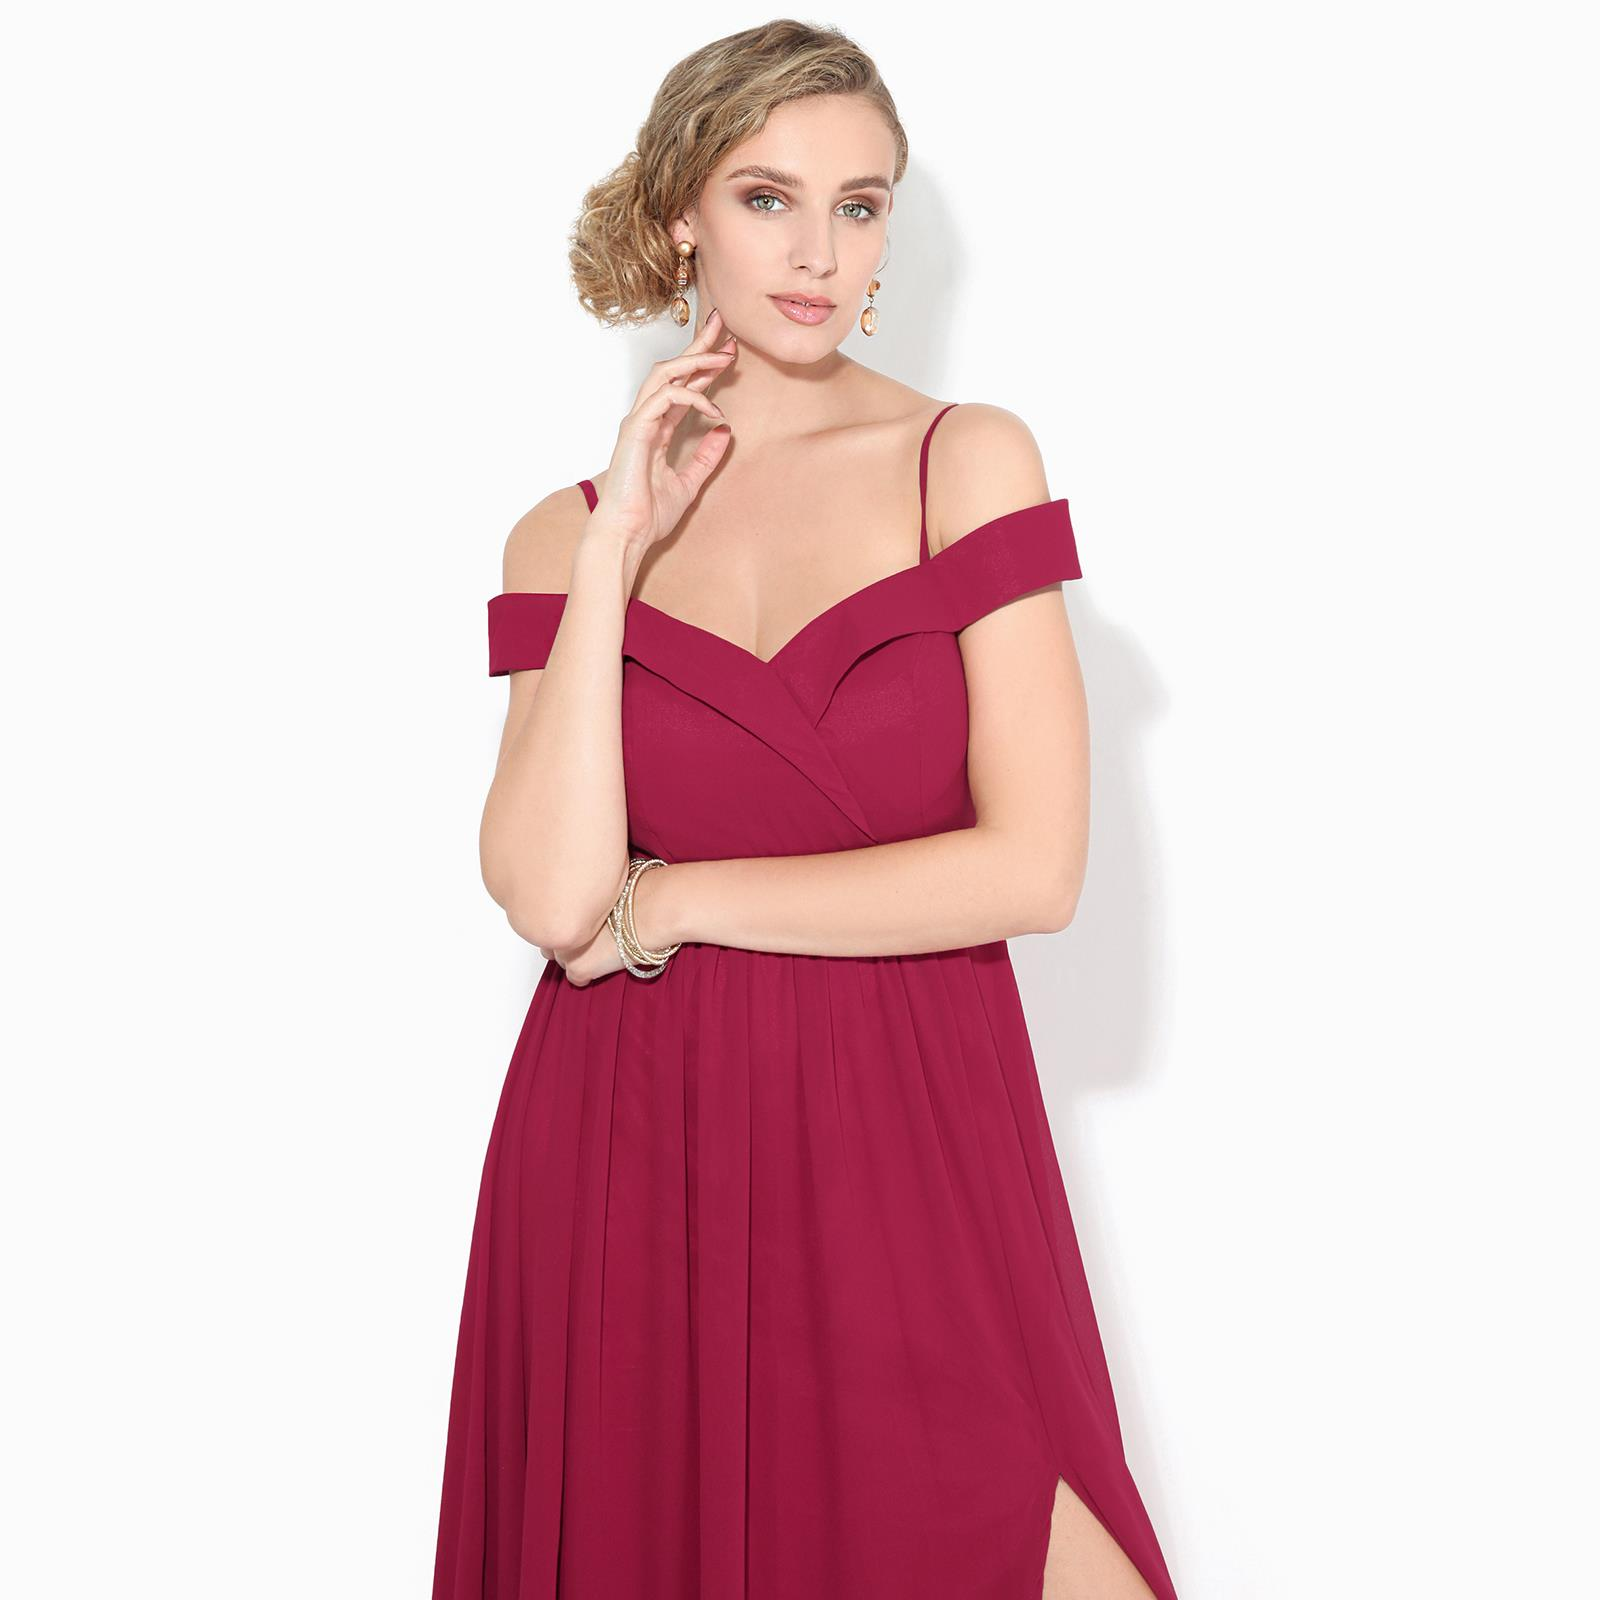 Womens-Ladies-Off-Shoulder-Formal-Maxi-Dress-Slit-Split-Long-Gown-Wedding-Party thumbnail 6